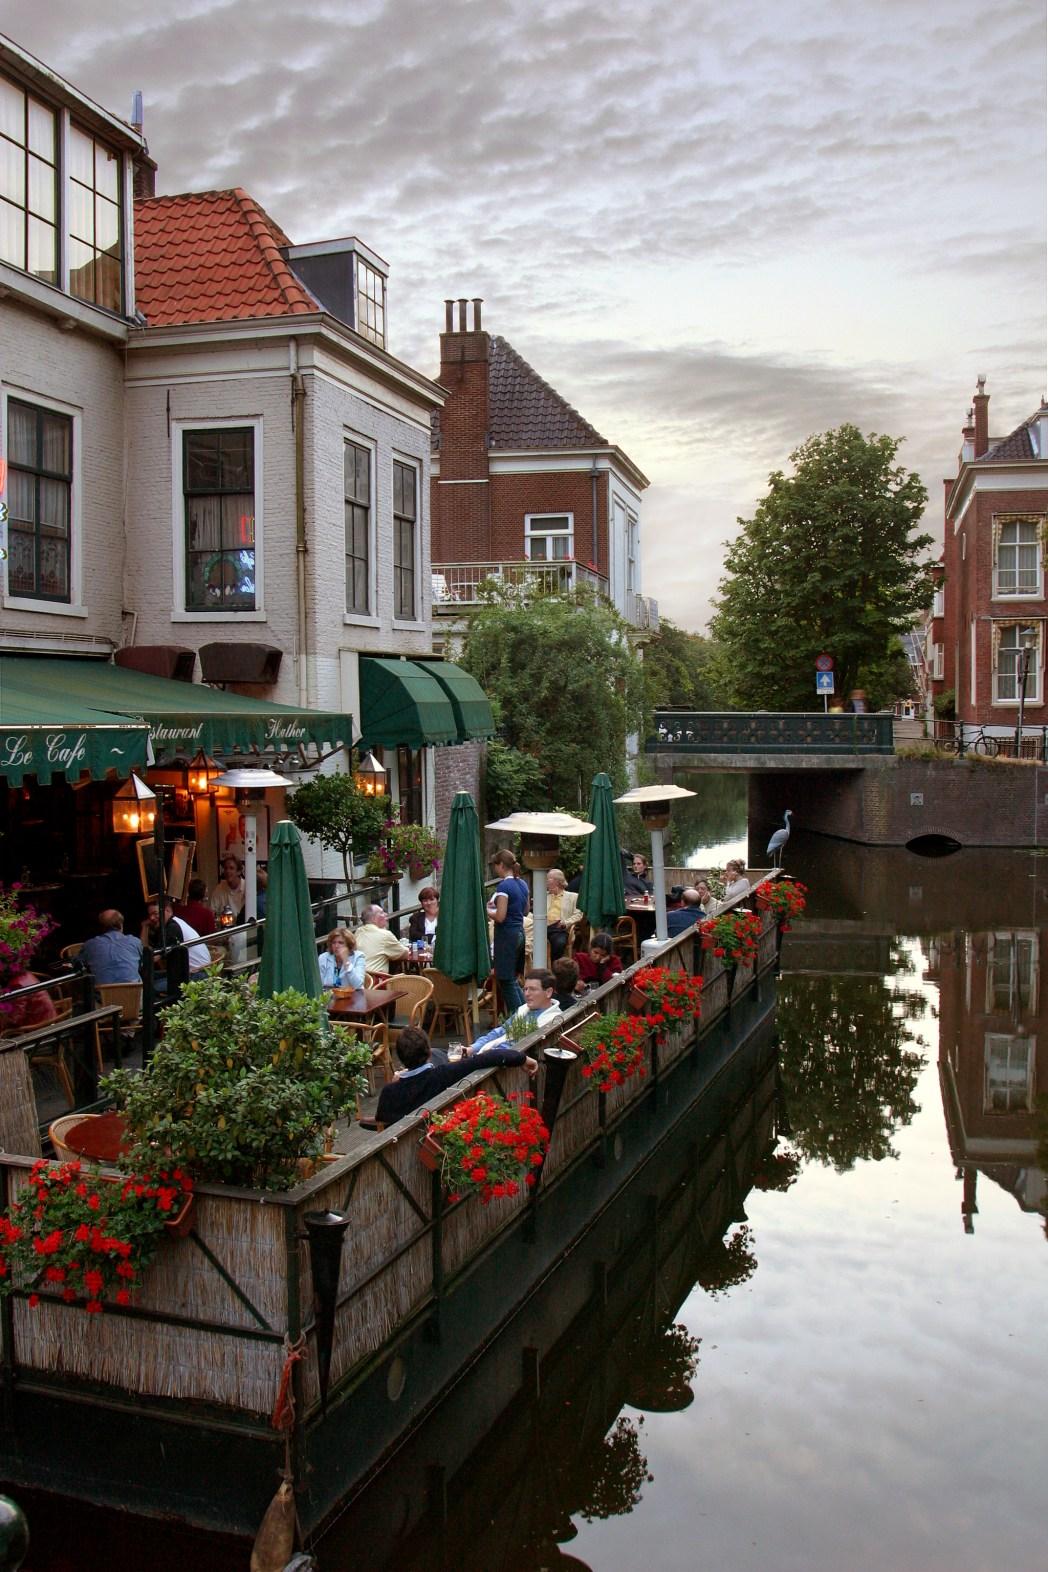 Smidswater Denneweg Den Haag